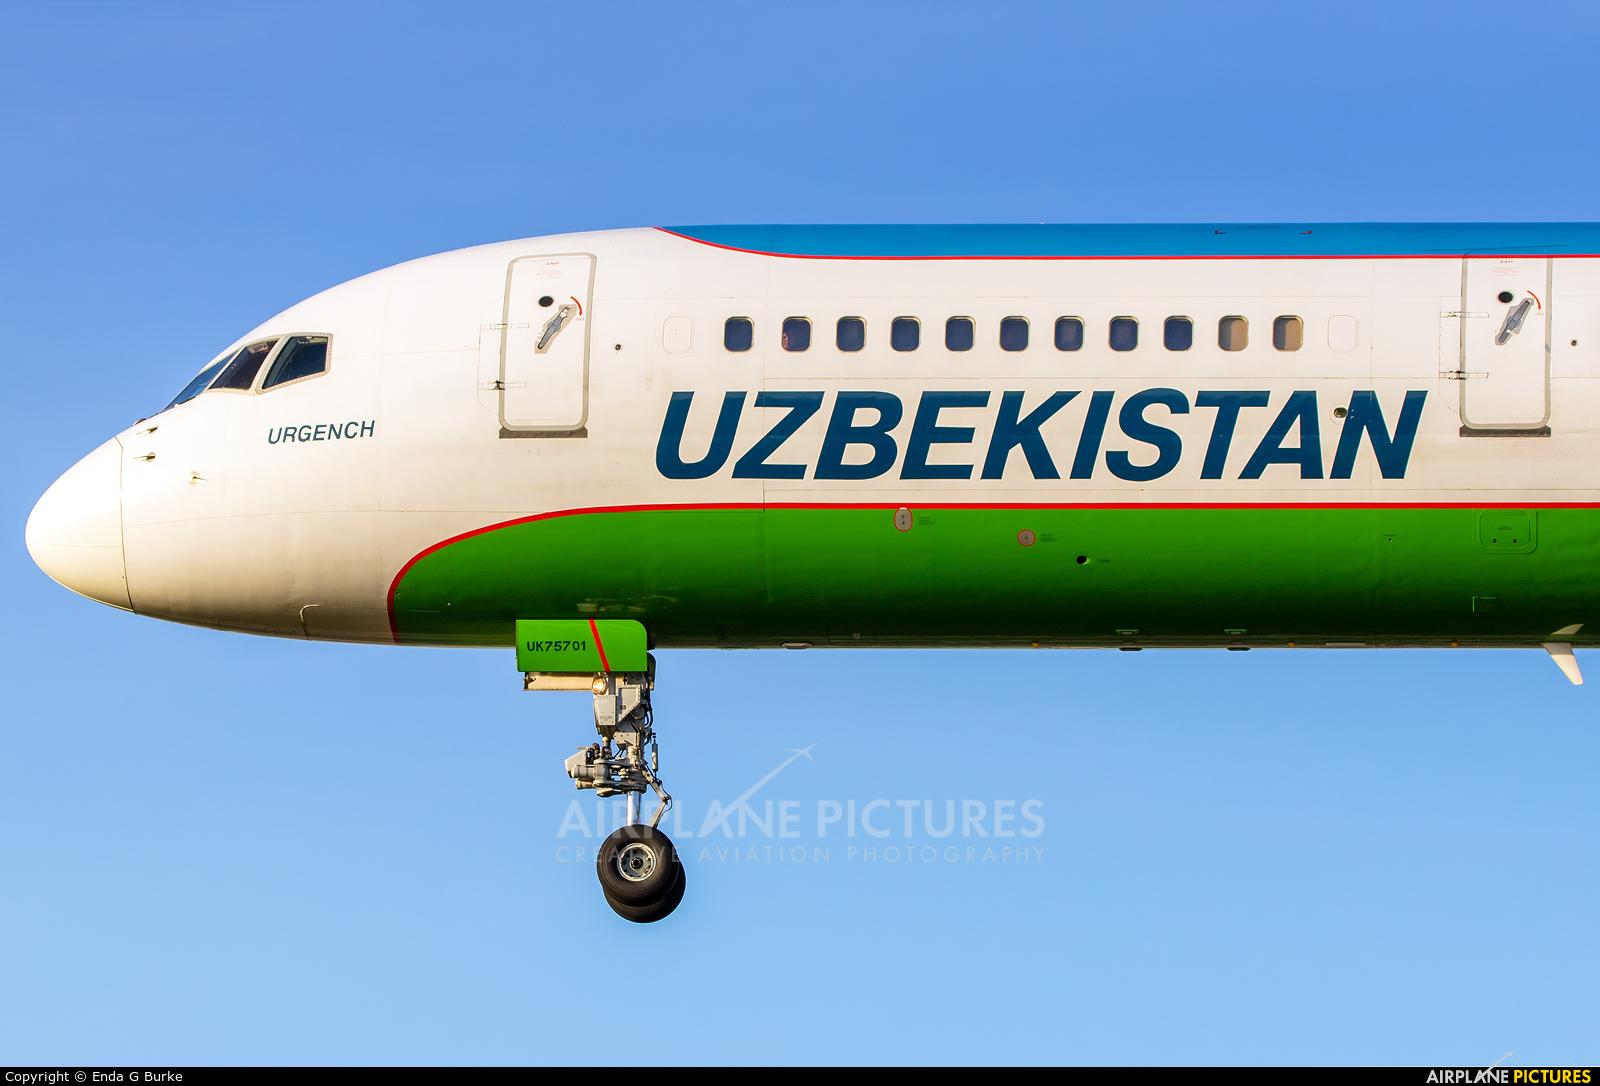 Uzbekistan Airways UK75701 aircraft at London - Heathrow